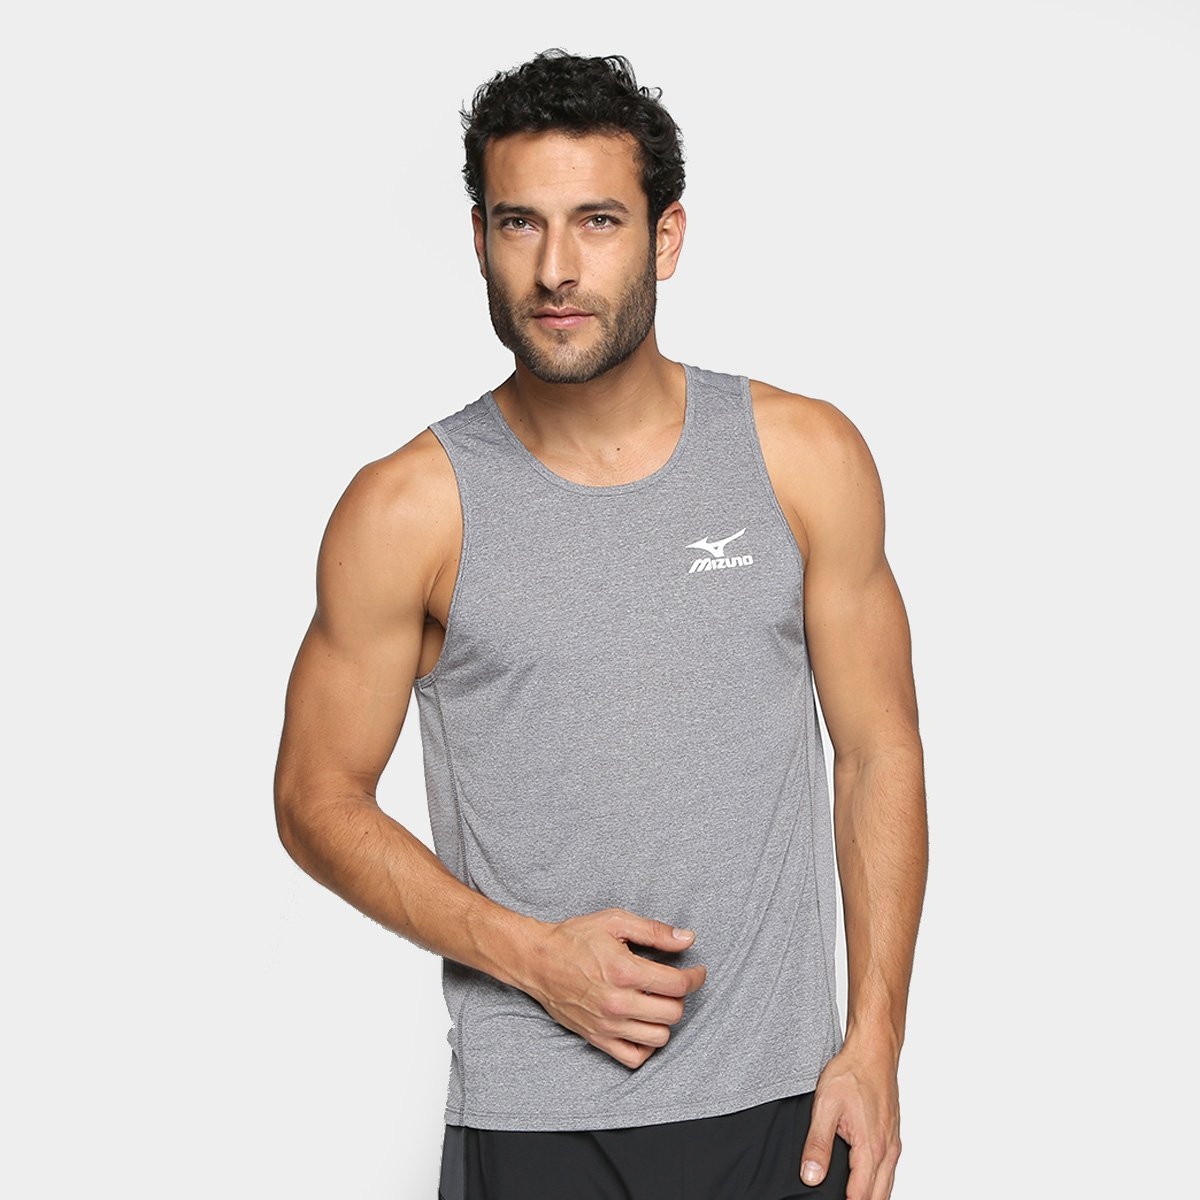 c6152c7198149 Camiseta Regata Mizuno Mesh Masculina - Compre Agora